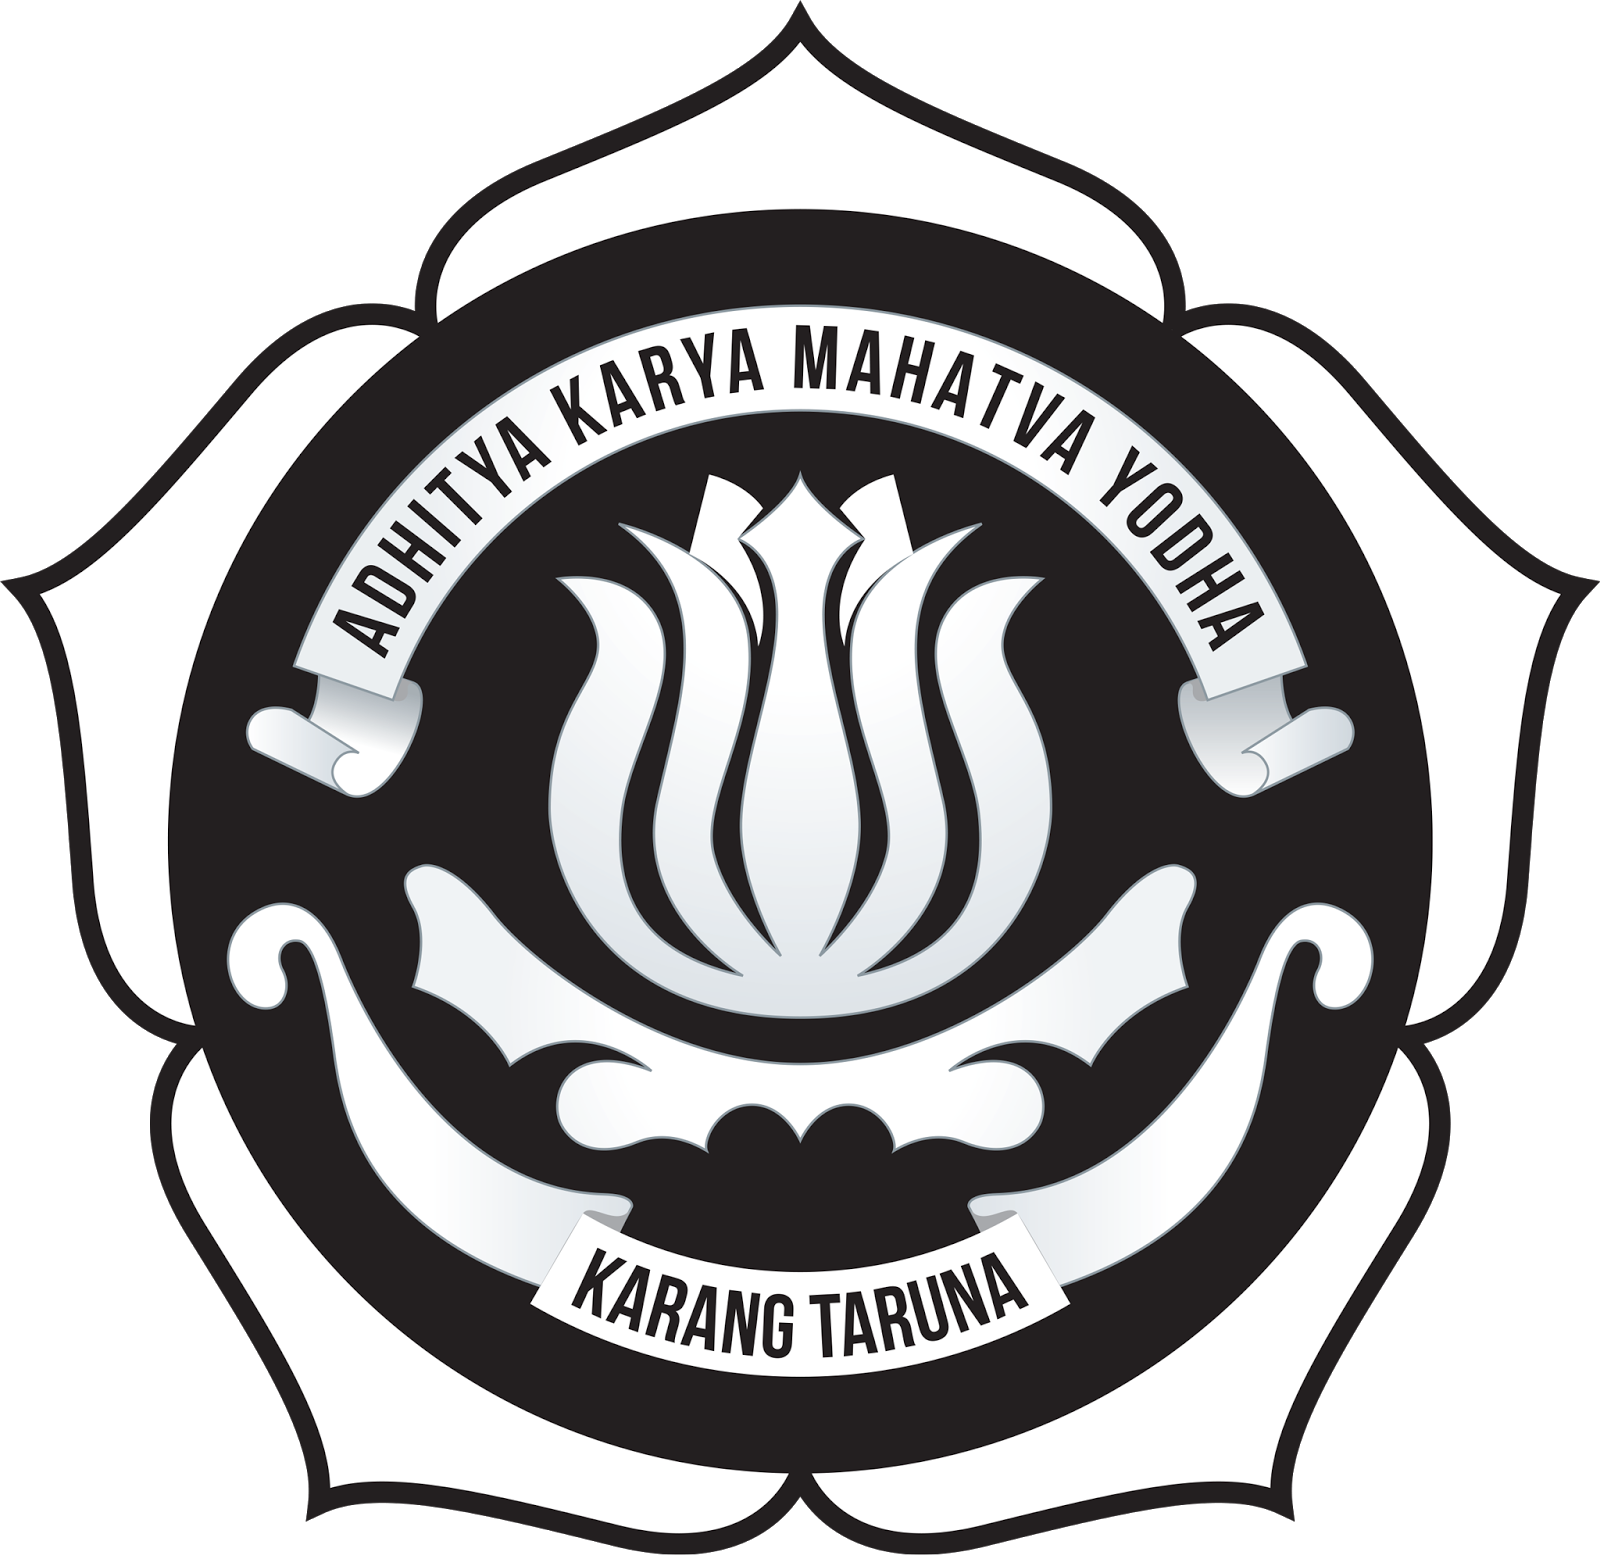 Logo Karang Taruna 237 Design Bw Gambar